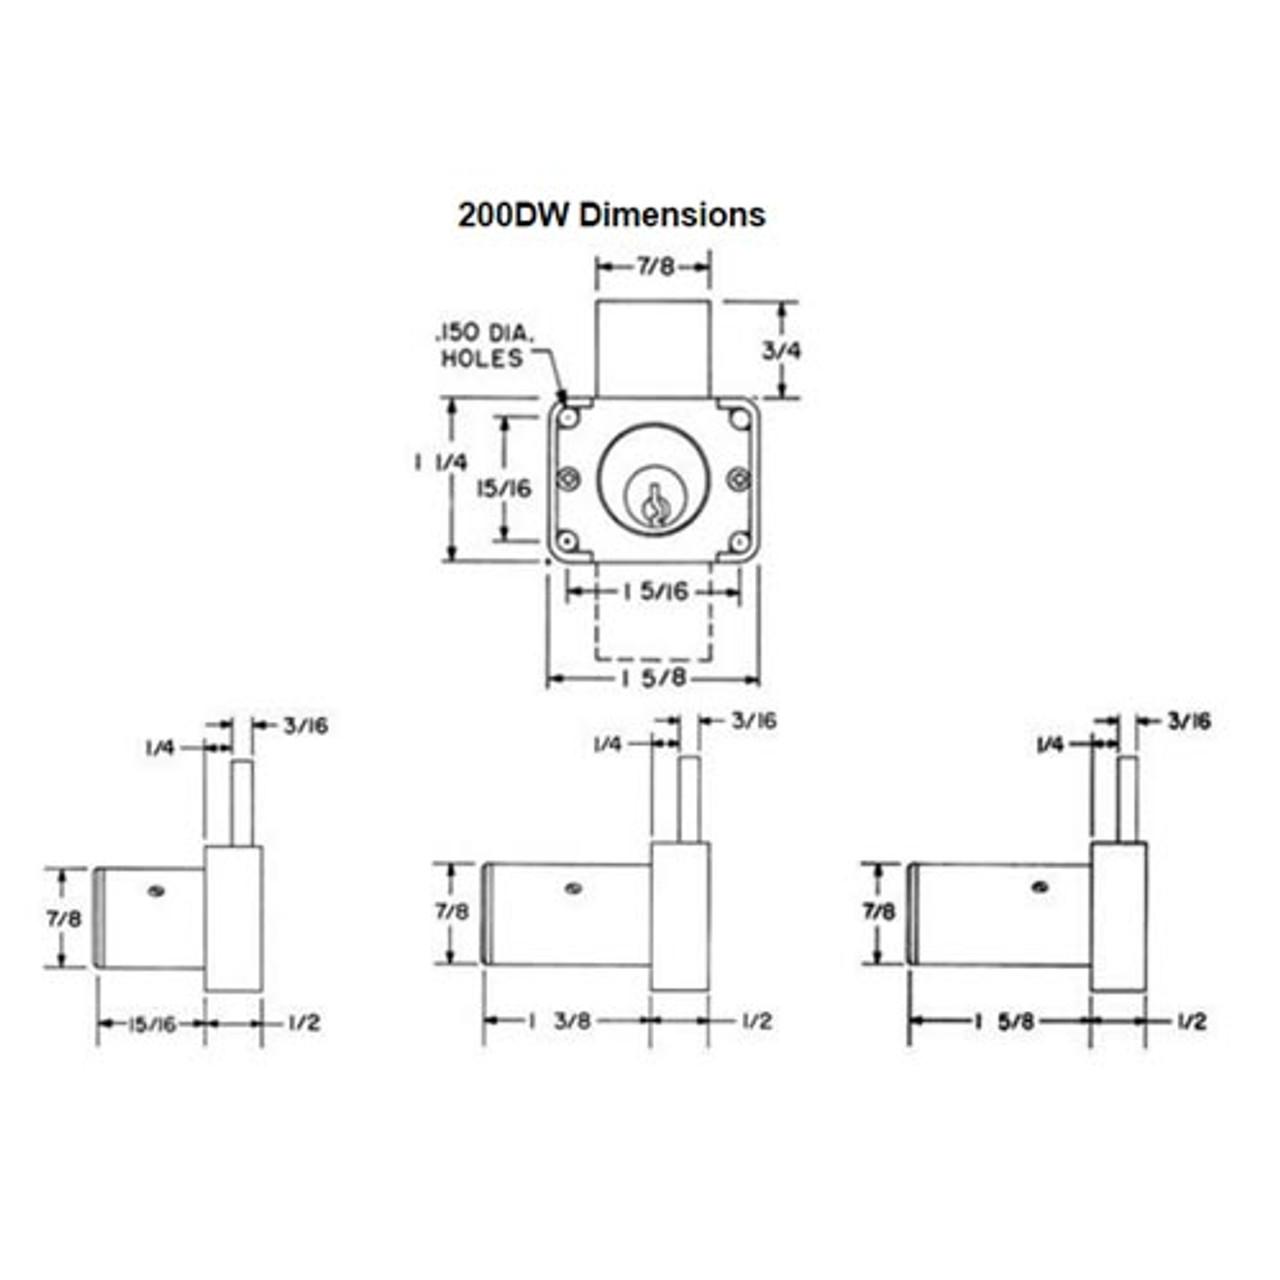 Olympus 200DW-KA107-26D-7/8 N Series Drawer Deadbolt Cabinet Locks in Satin Chrome